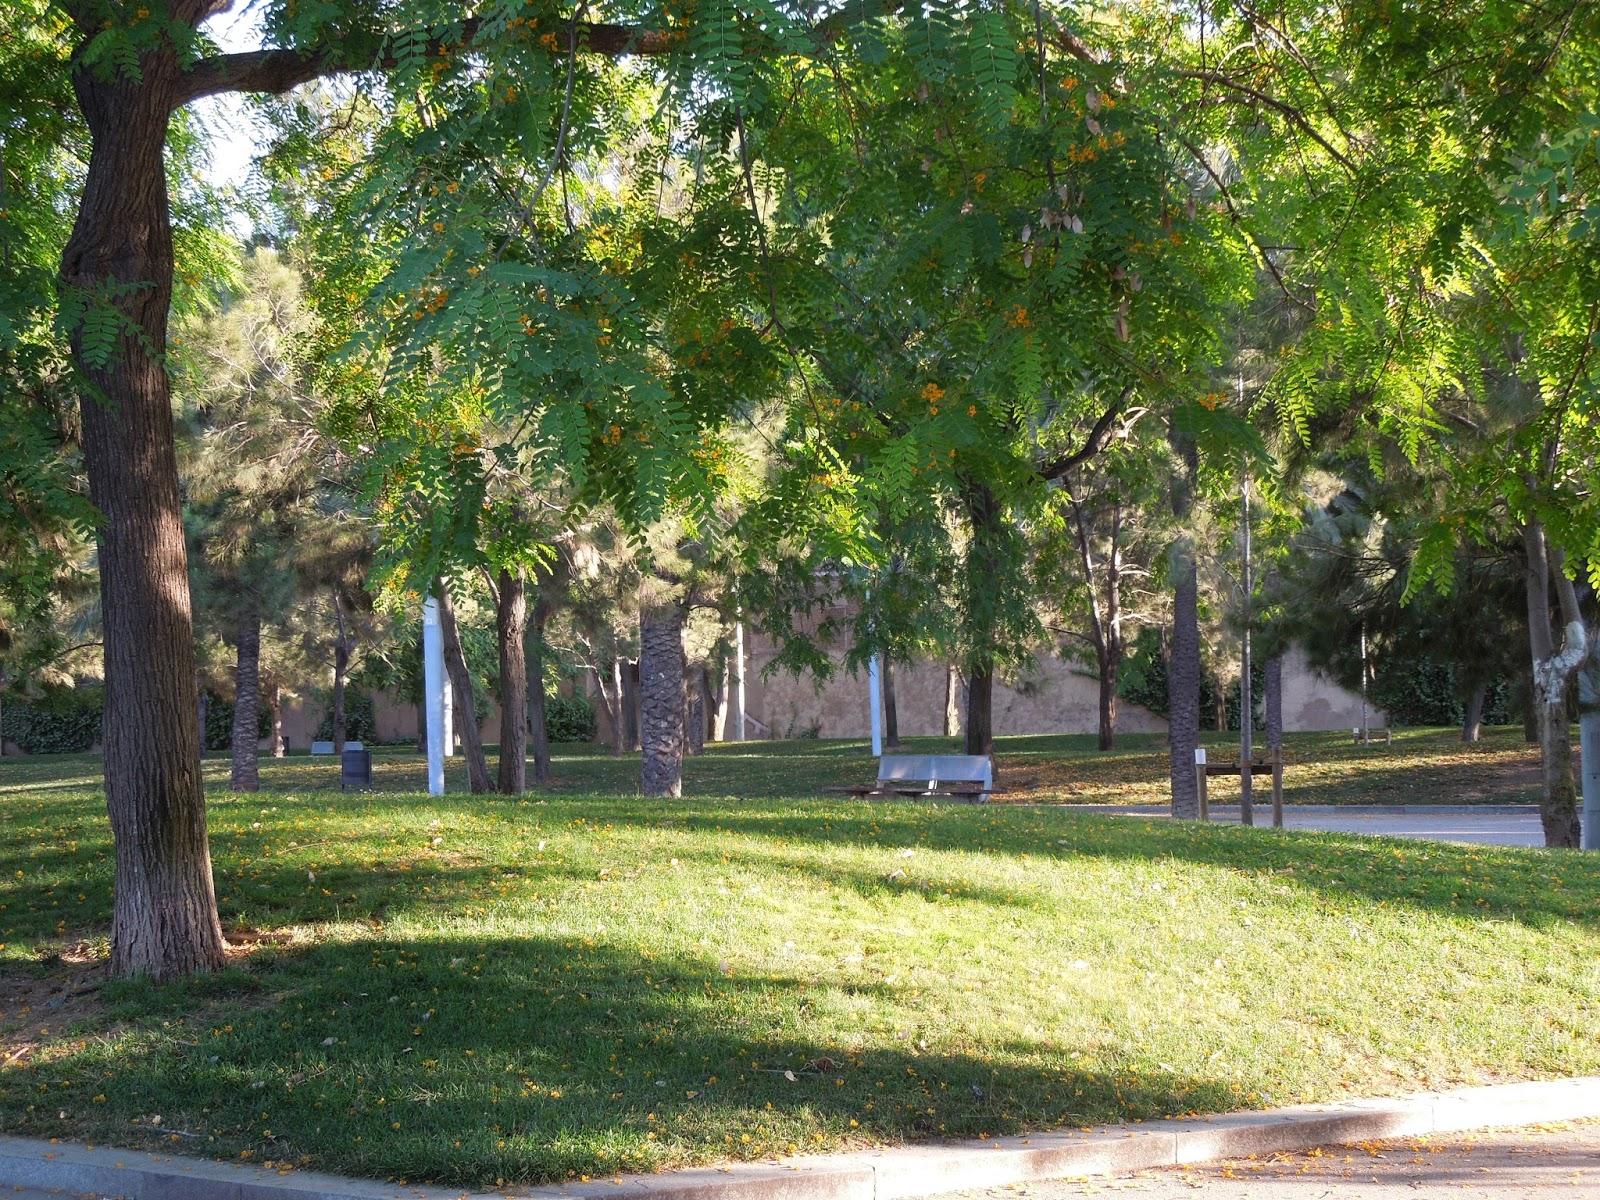 Barcelona parque de la barceloneta a dos pasos del paraiso for Parques de barcelona